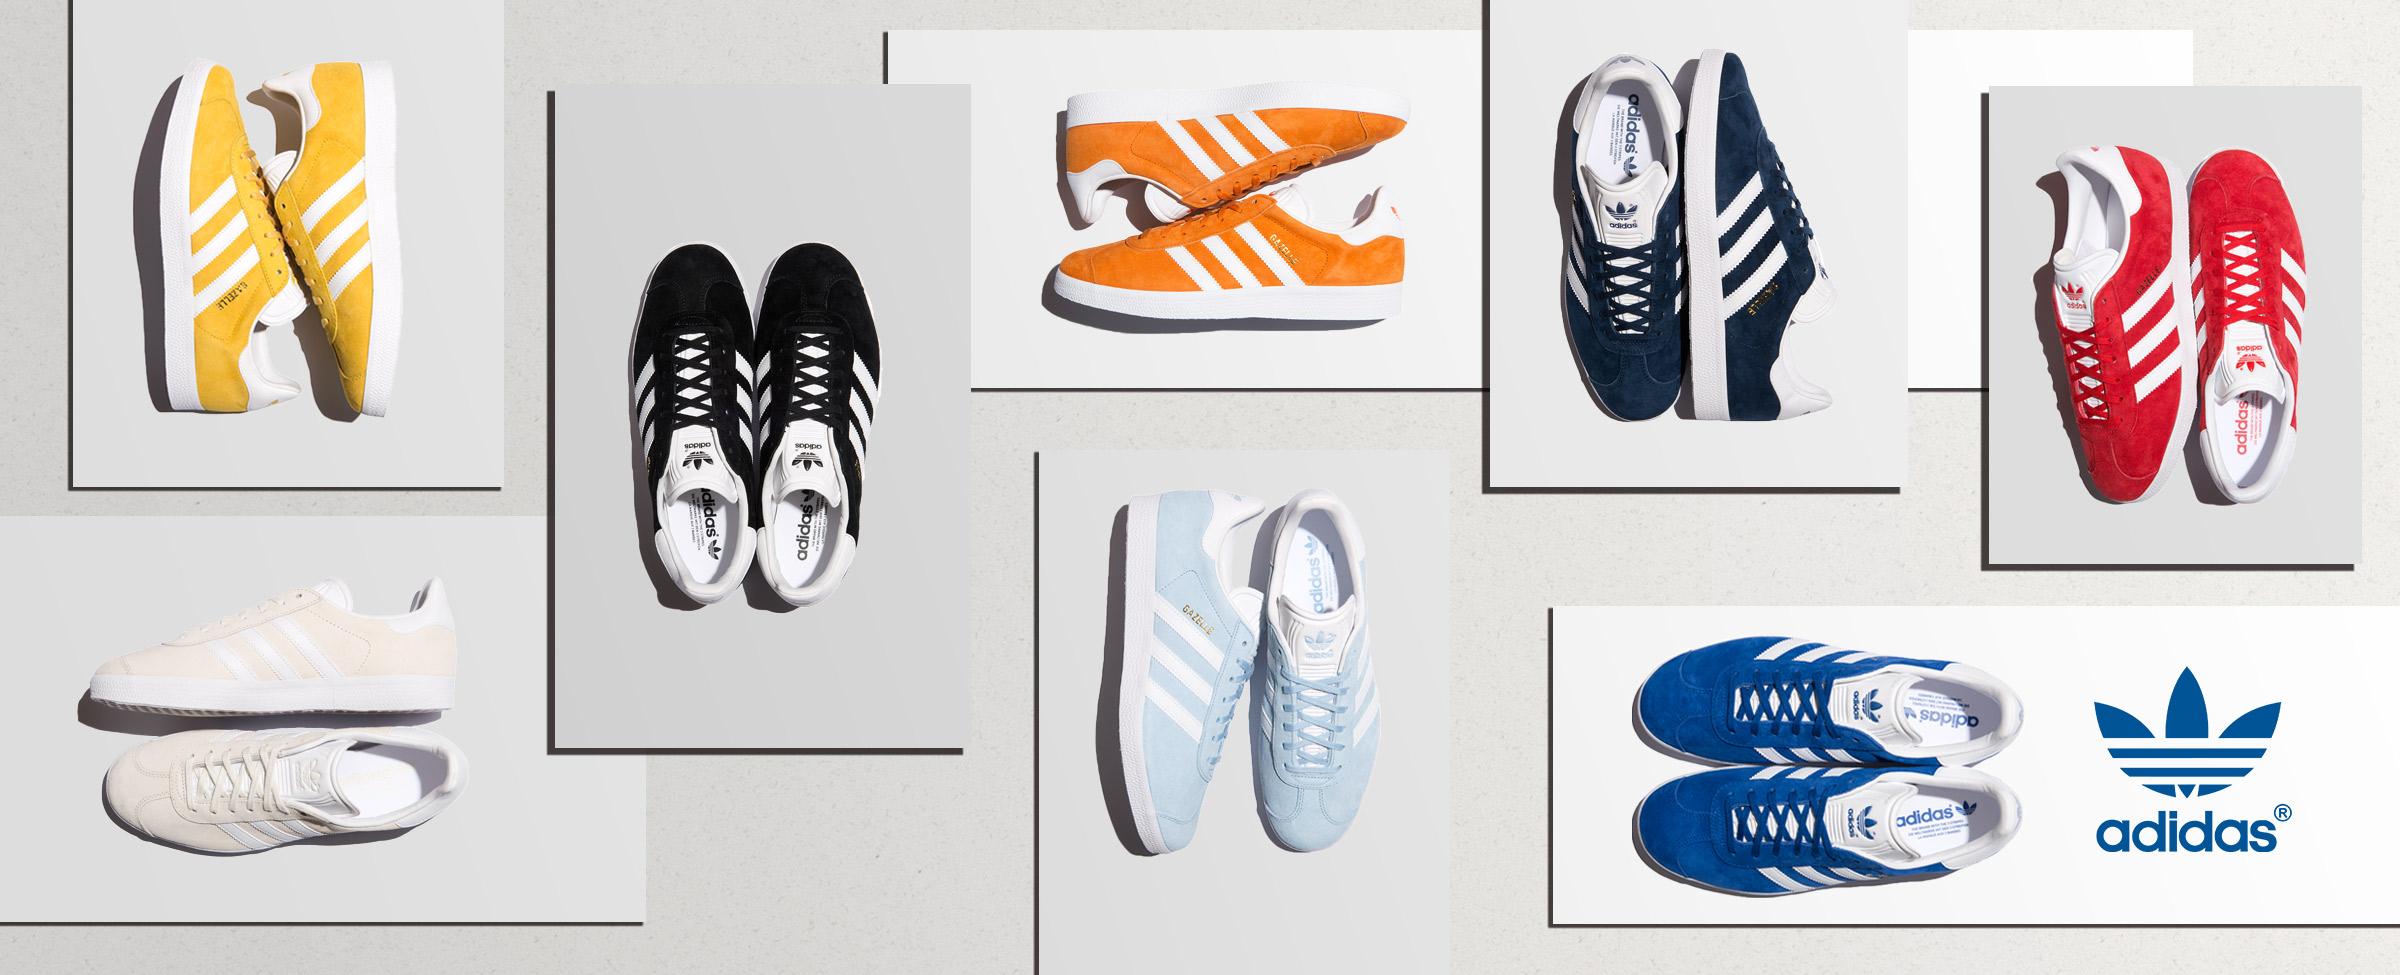 Banner-Home-Adidas-Gazelle-20161030-1.jpg